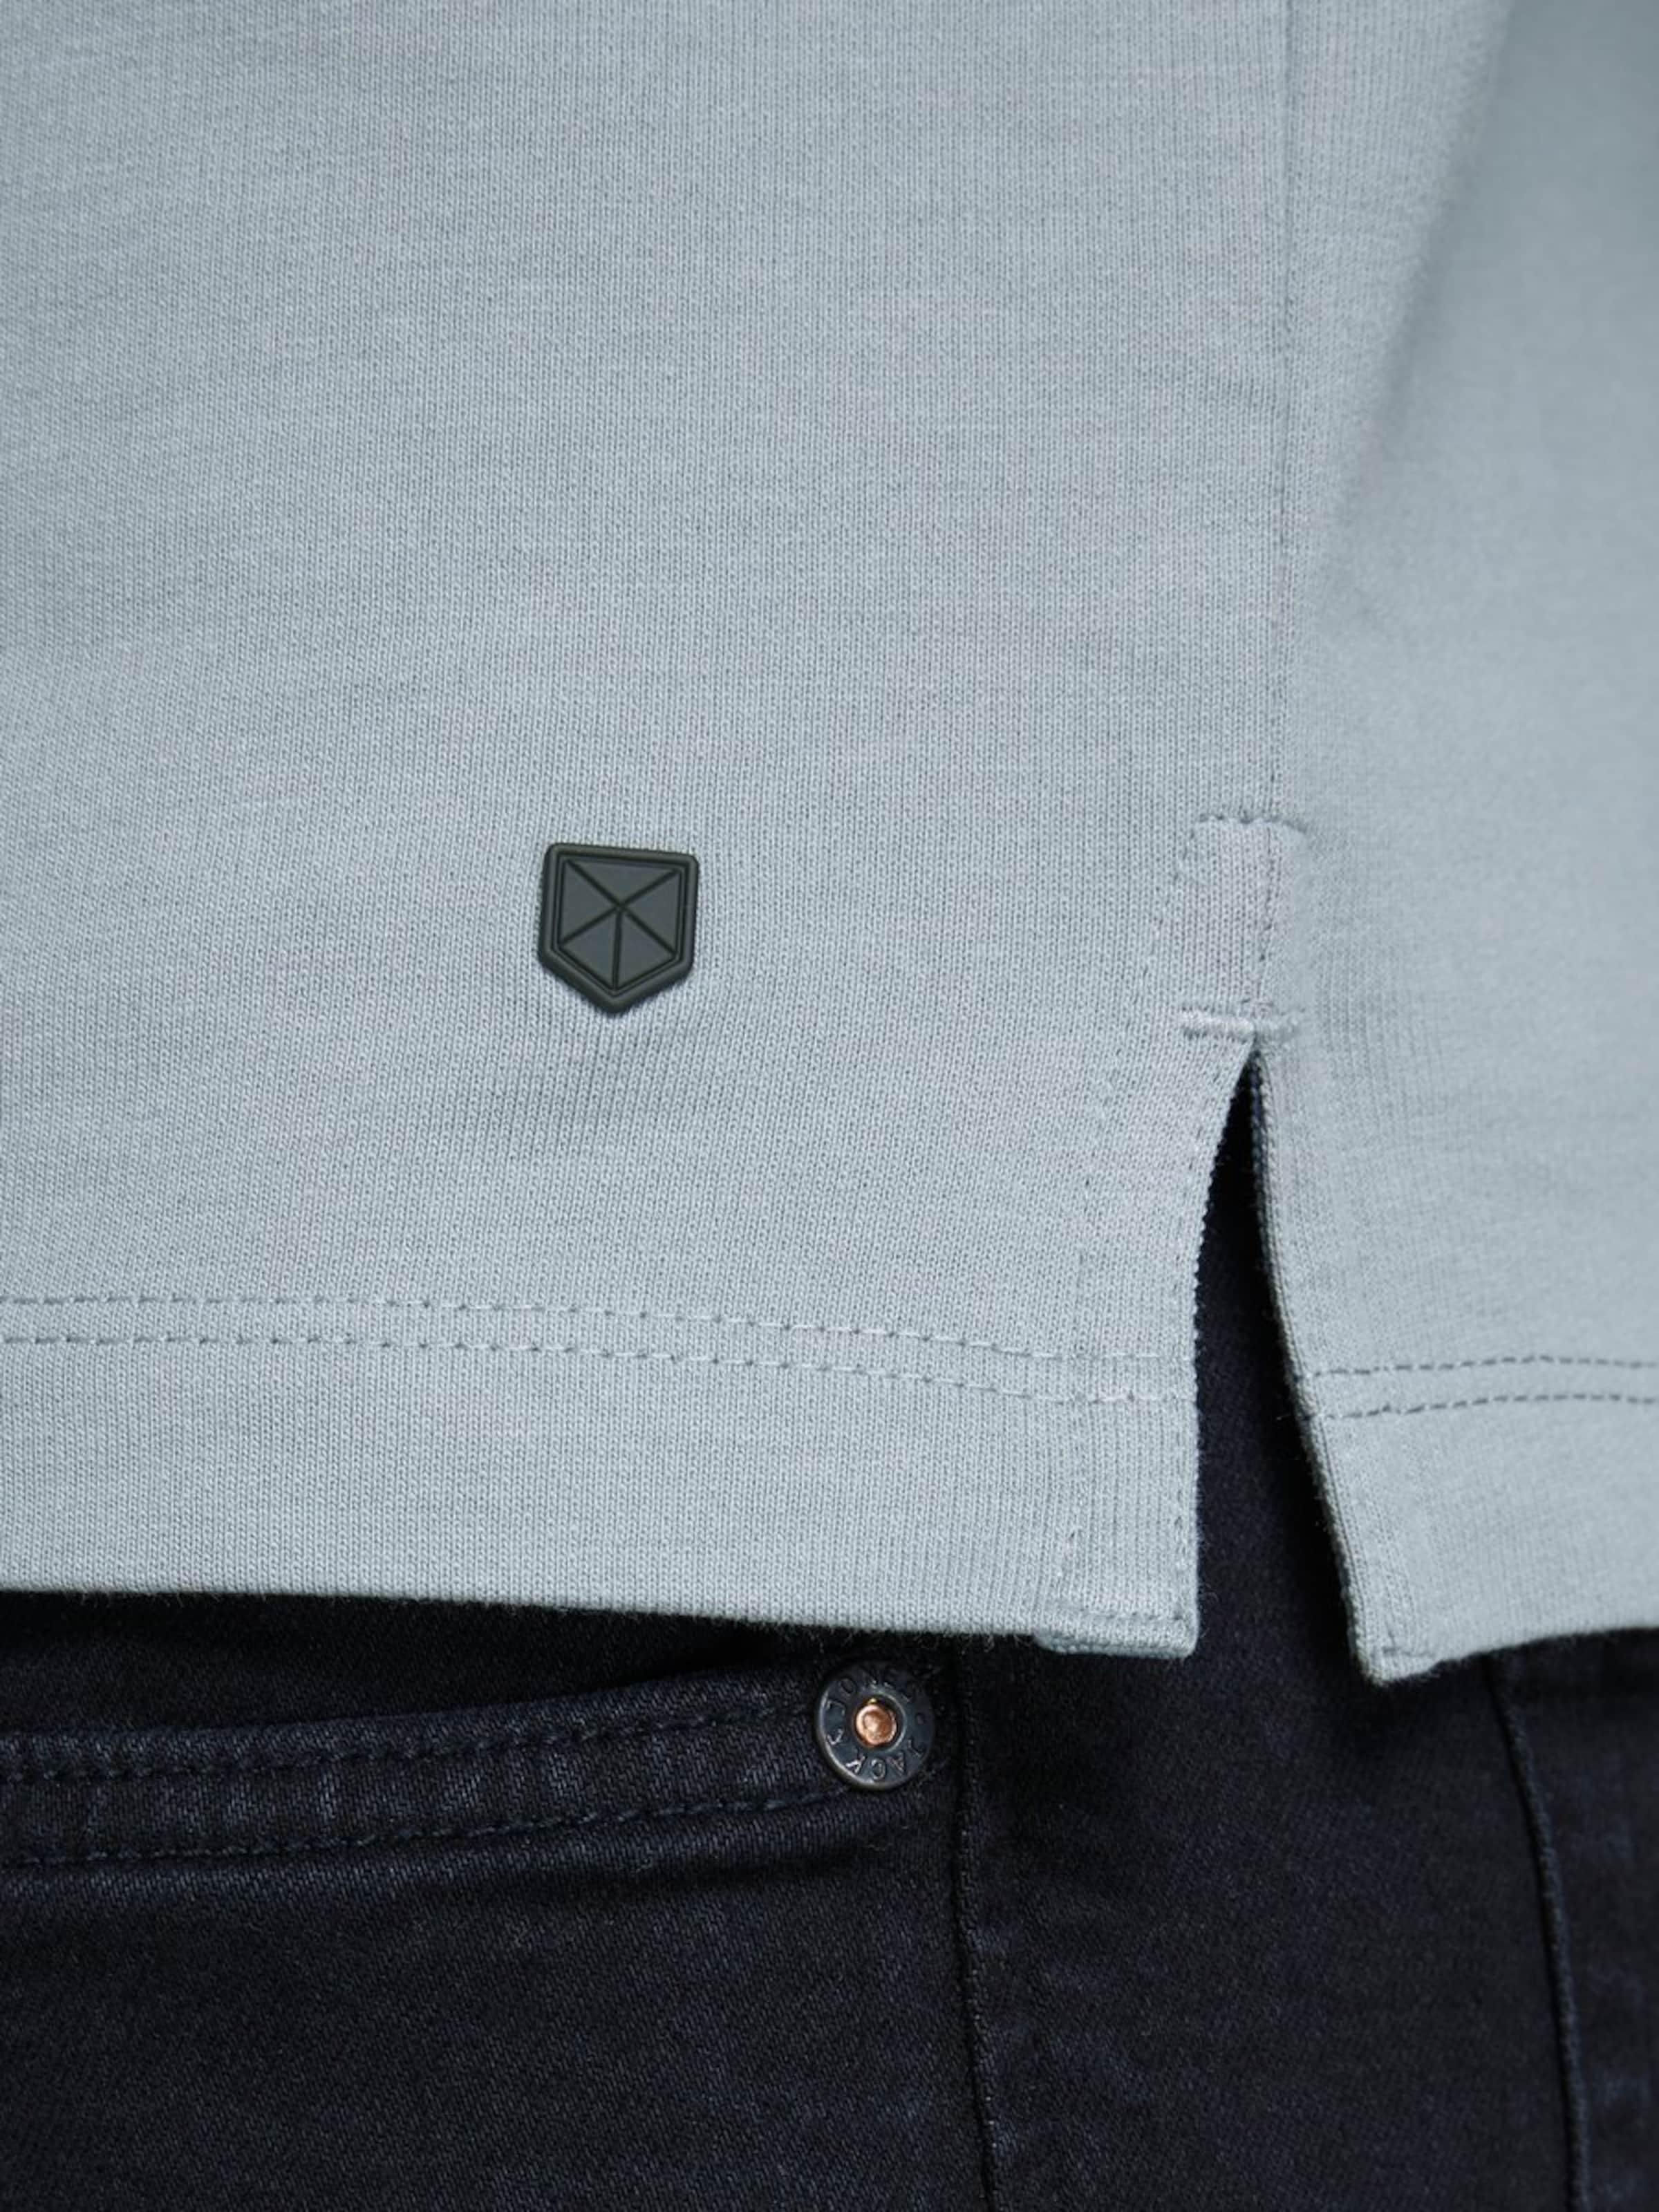 In Poloshirt Jackamp; Jones Poloshirt Jackamp; Jones In Rauchgrau Rauchgrau Jones Jackamp; sBtrChQxd